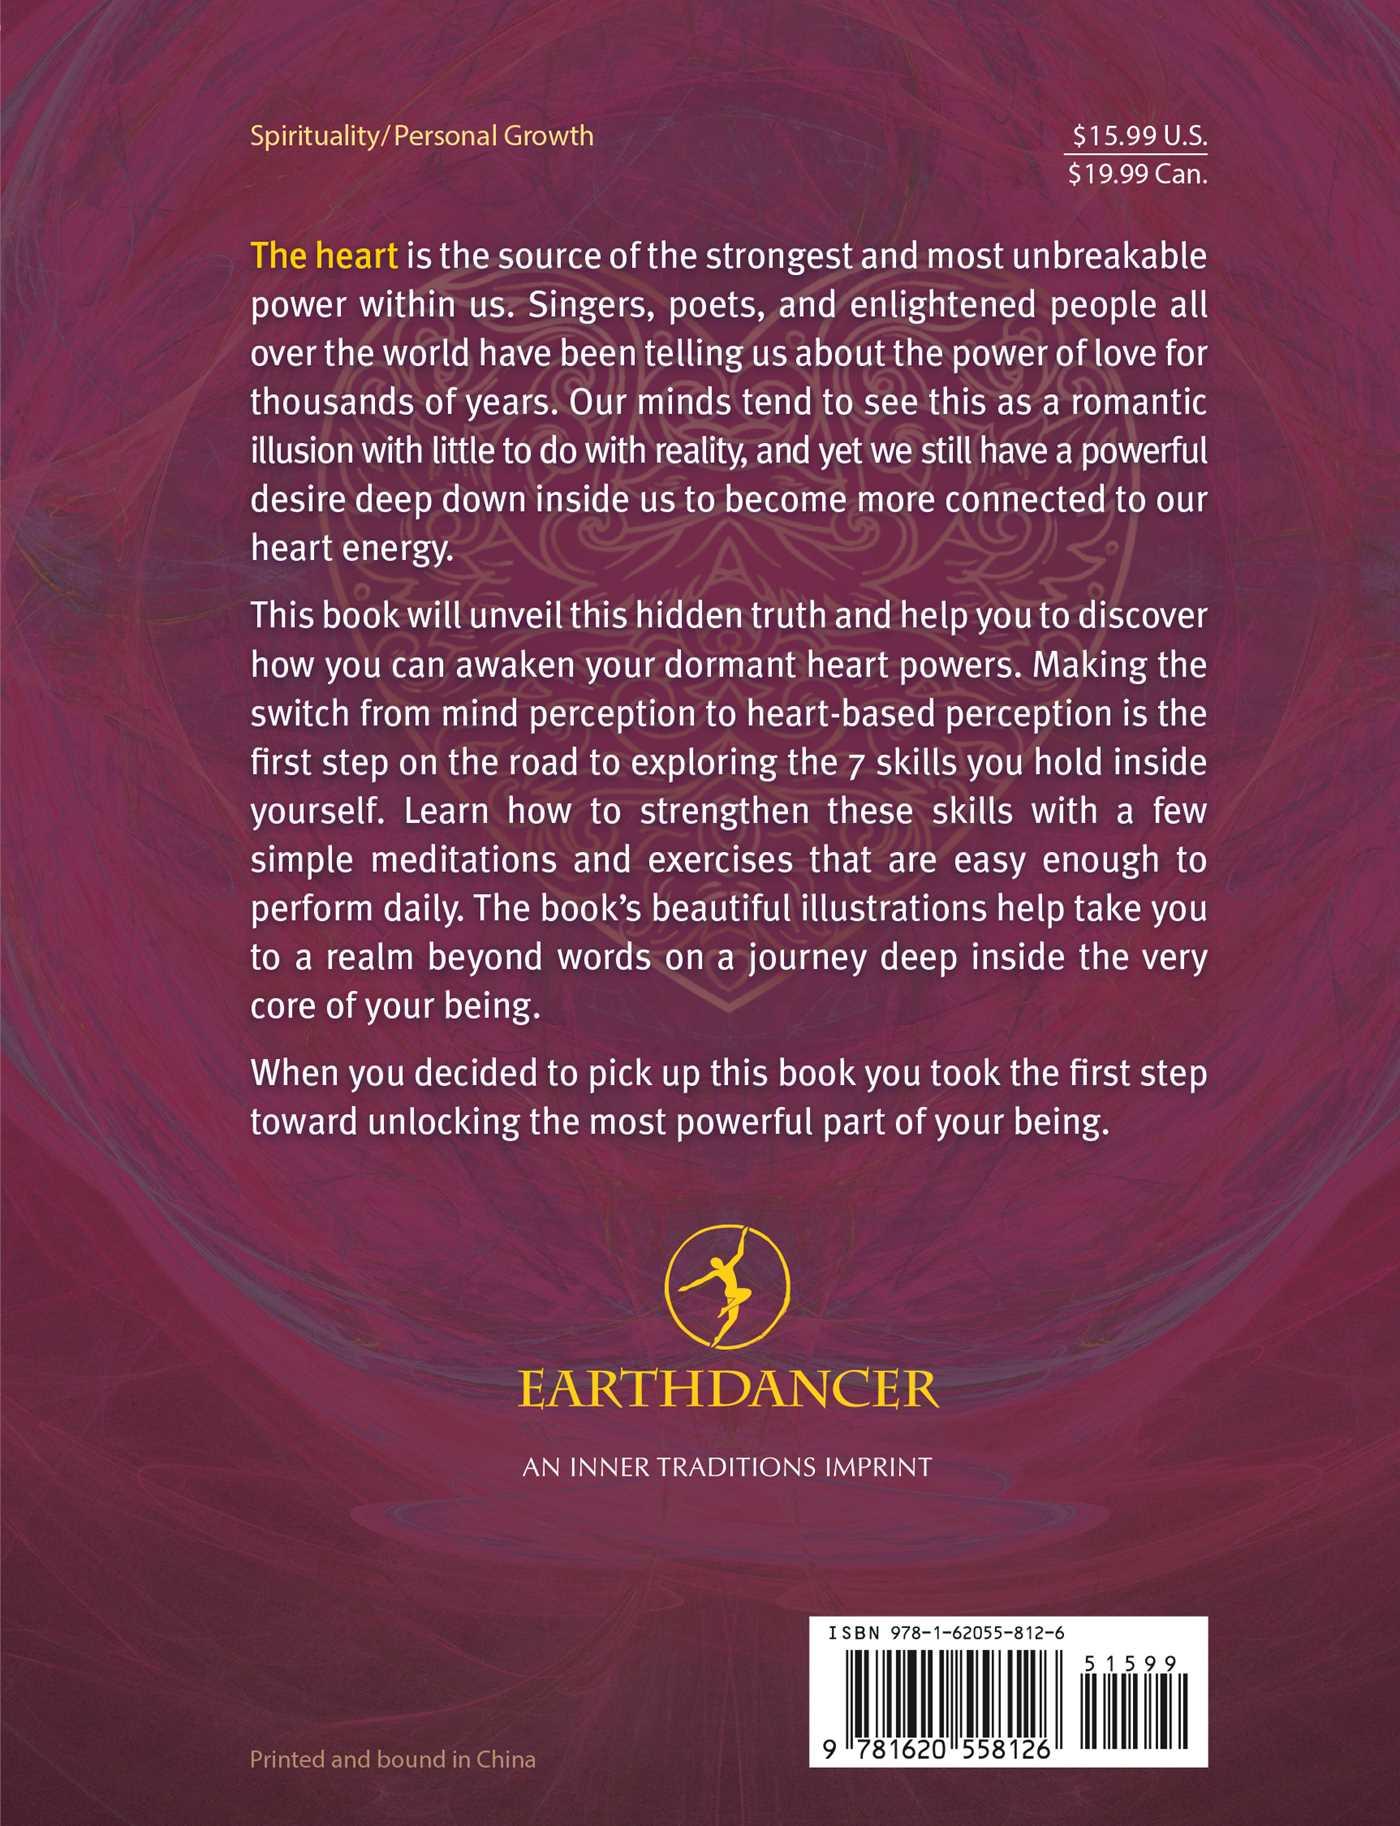 Unlocking the 7 secret powers of the heart 9781620558126 hr back